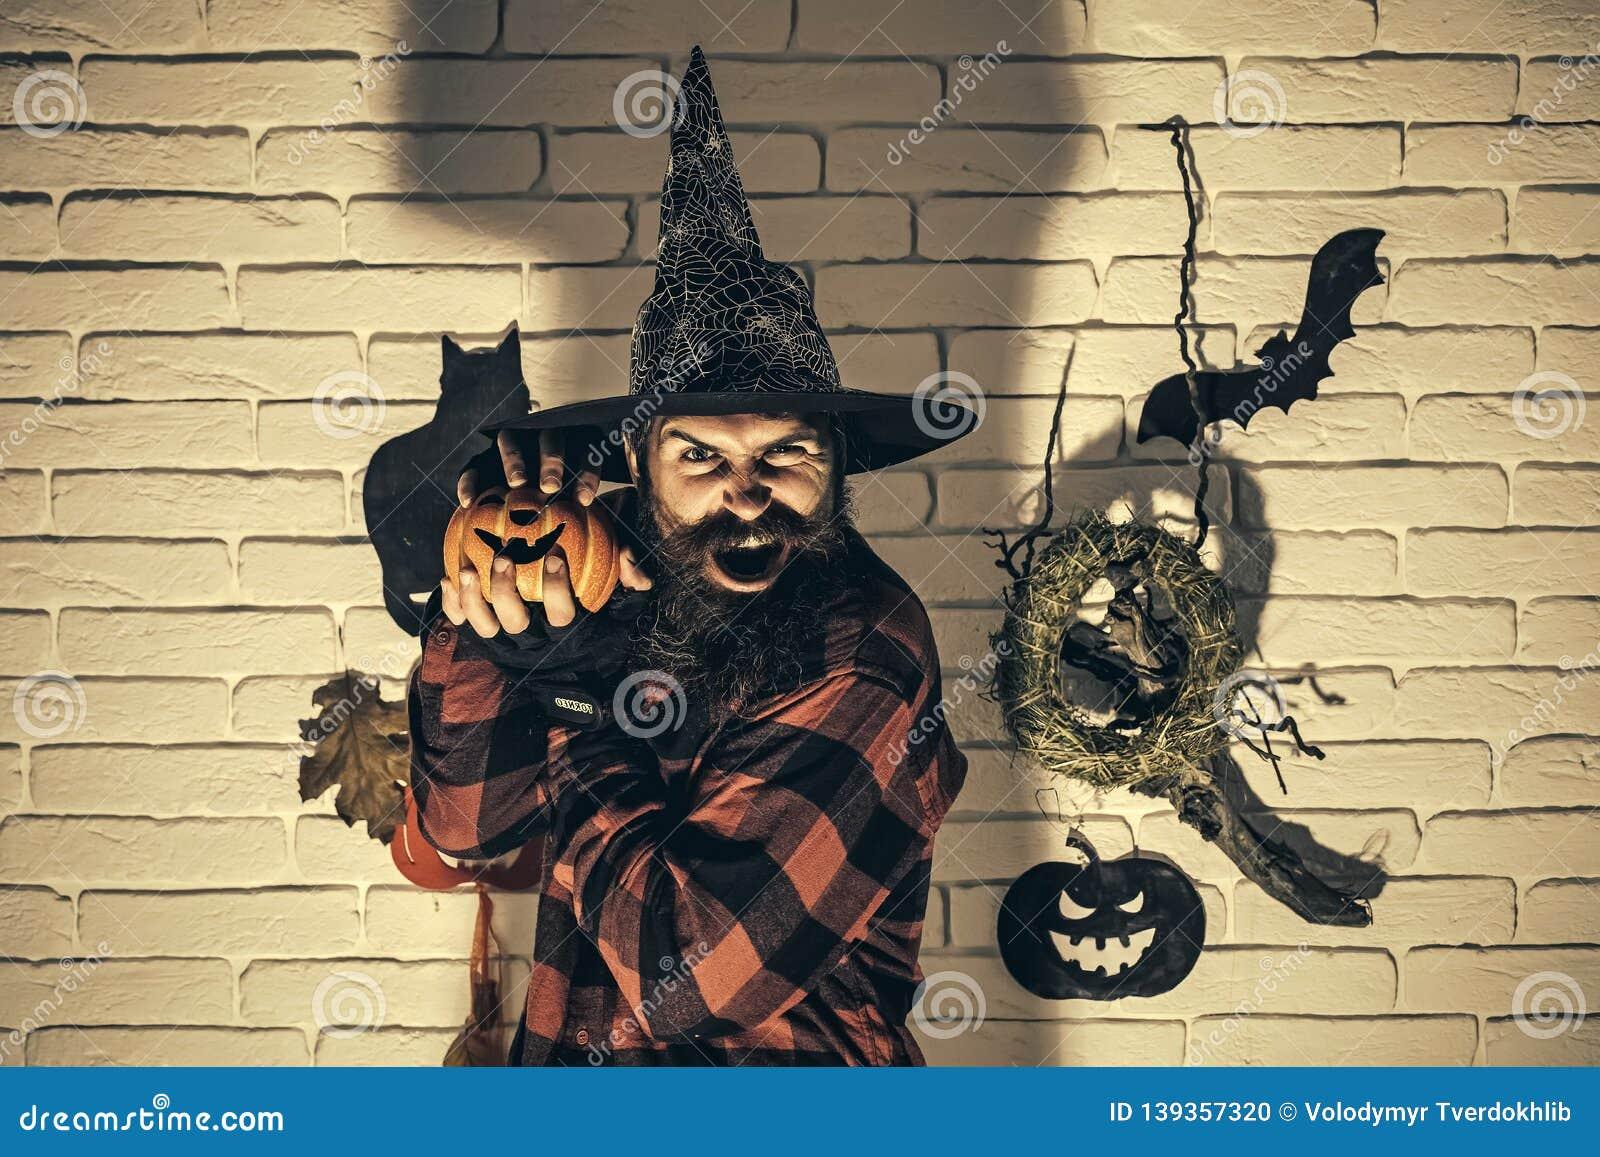 Trick Or Treat Halloween Evil Pumpkin Scary Jack-o-lantern Horror Mens T-shirt